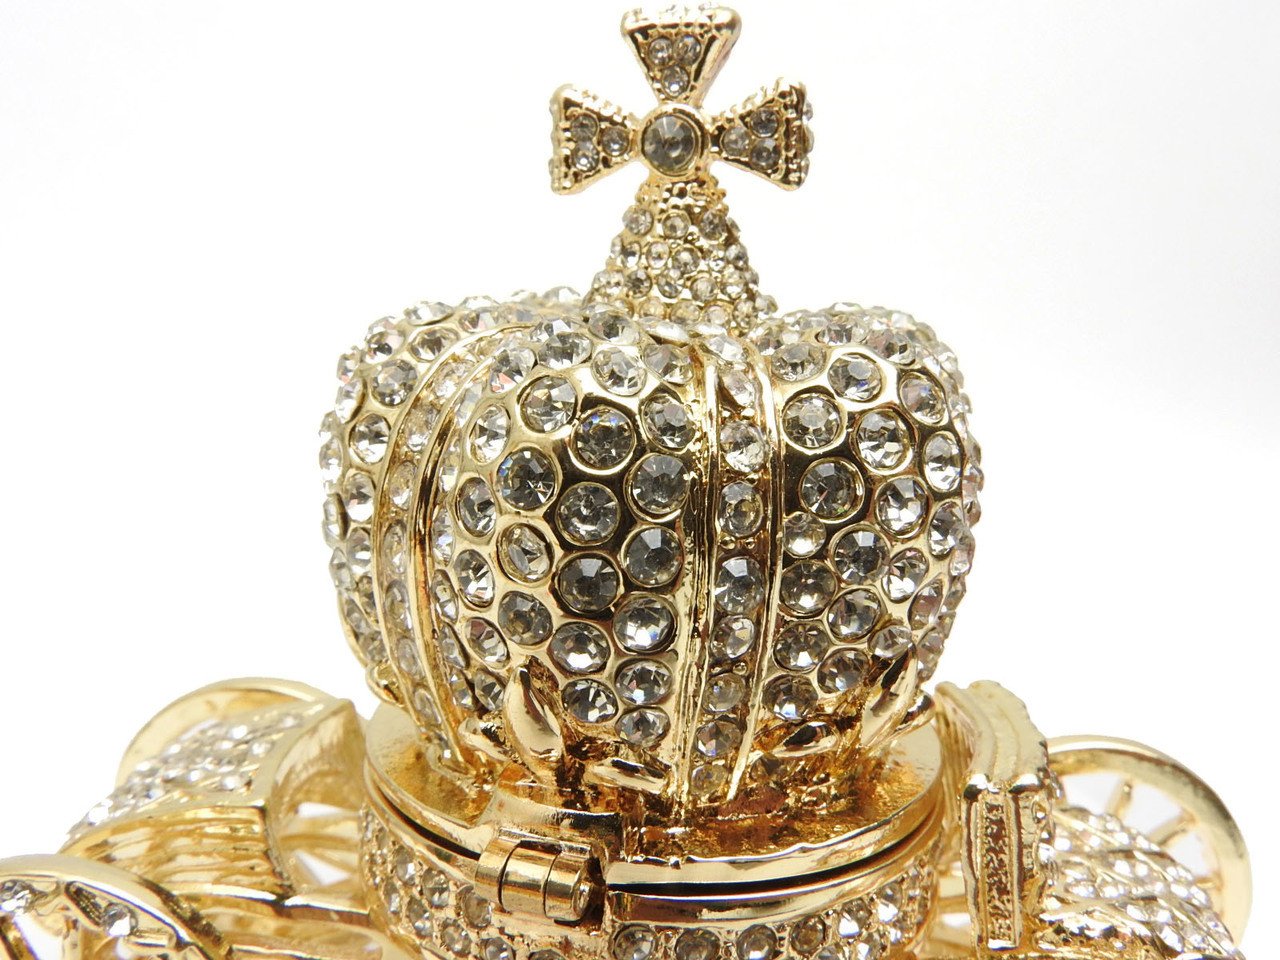 Brilliant Crystal Coronation Carriage